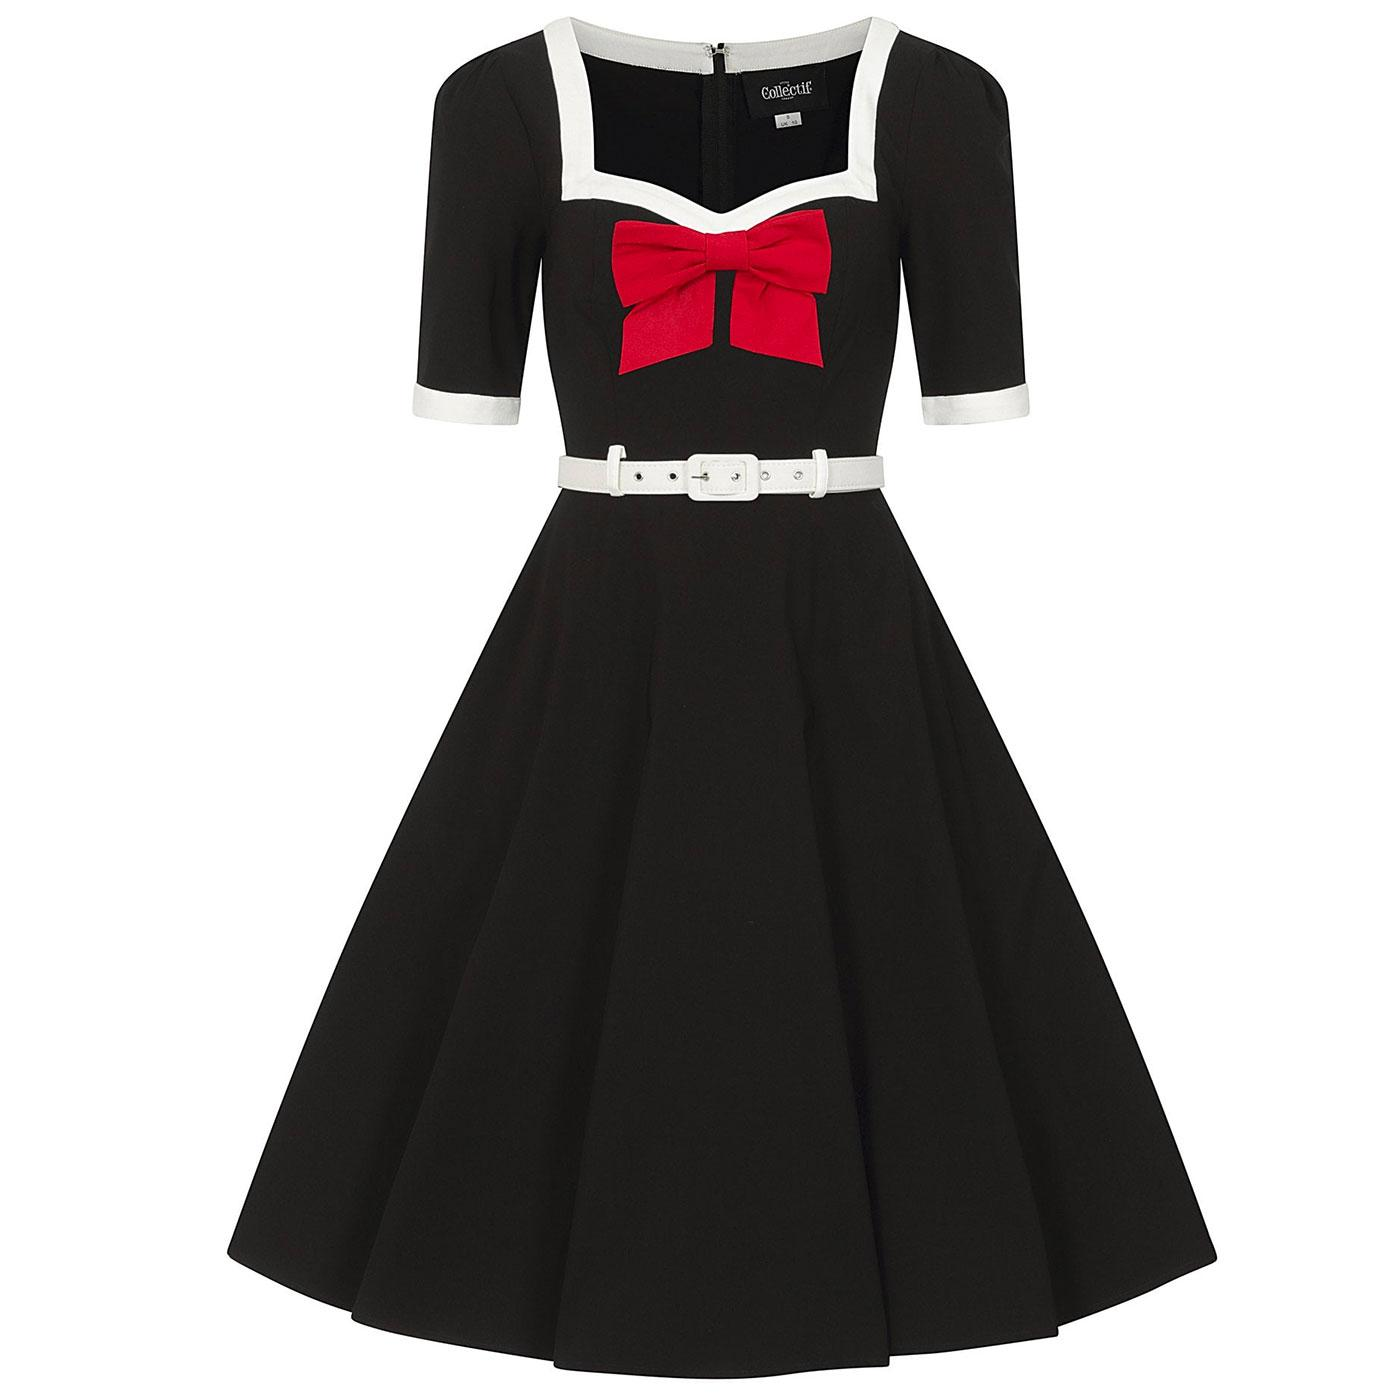 Sadie COLLECTIF Retro 50s Swing Dress in Black